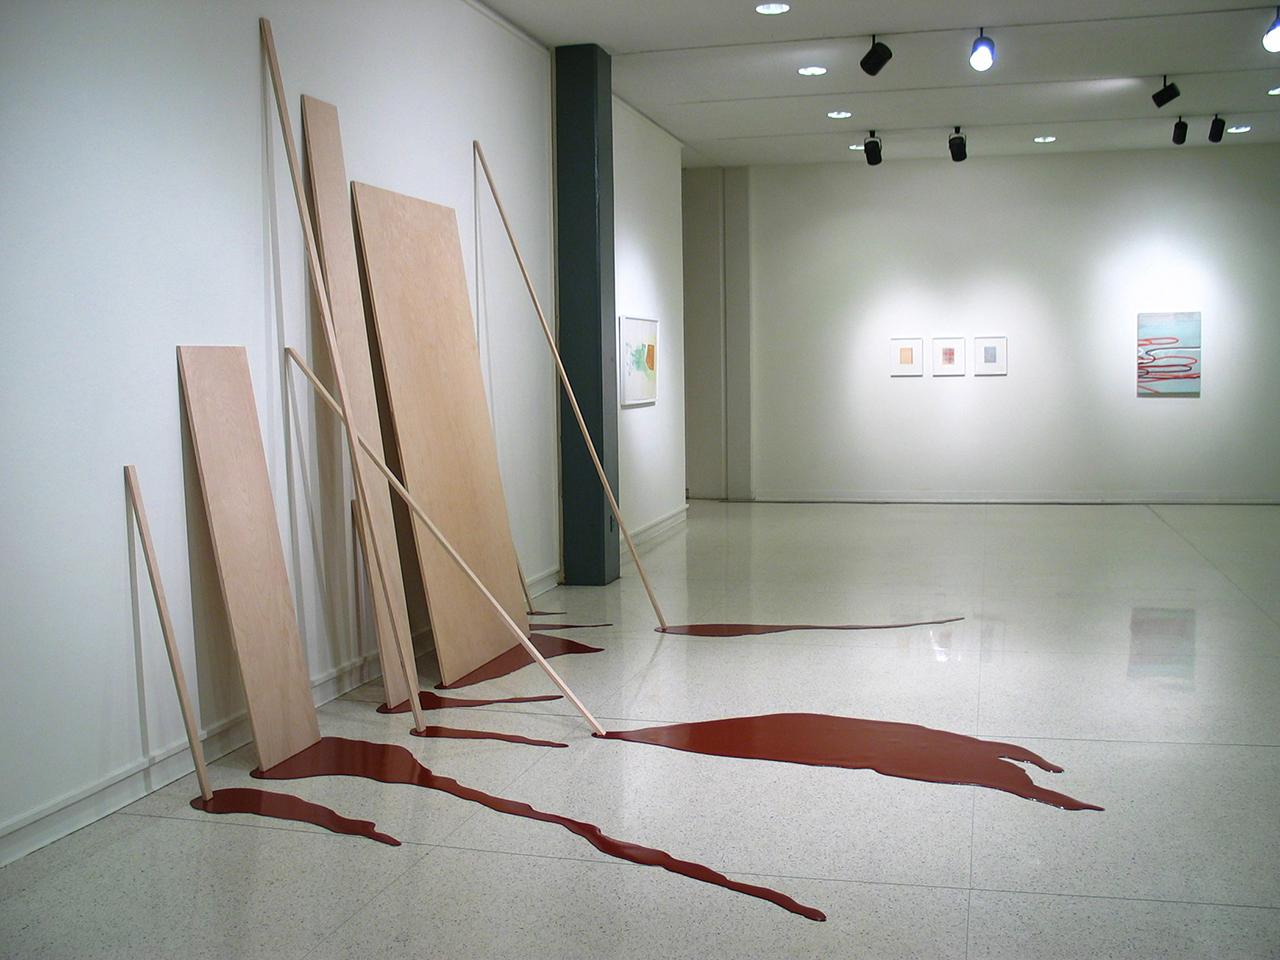 Seep , 2004, wood, poured paint, vinyl flooring, 12' x 15' x 10'